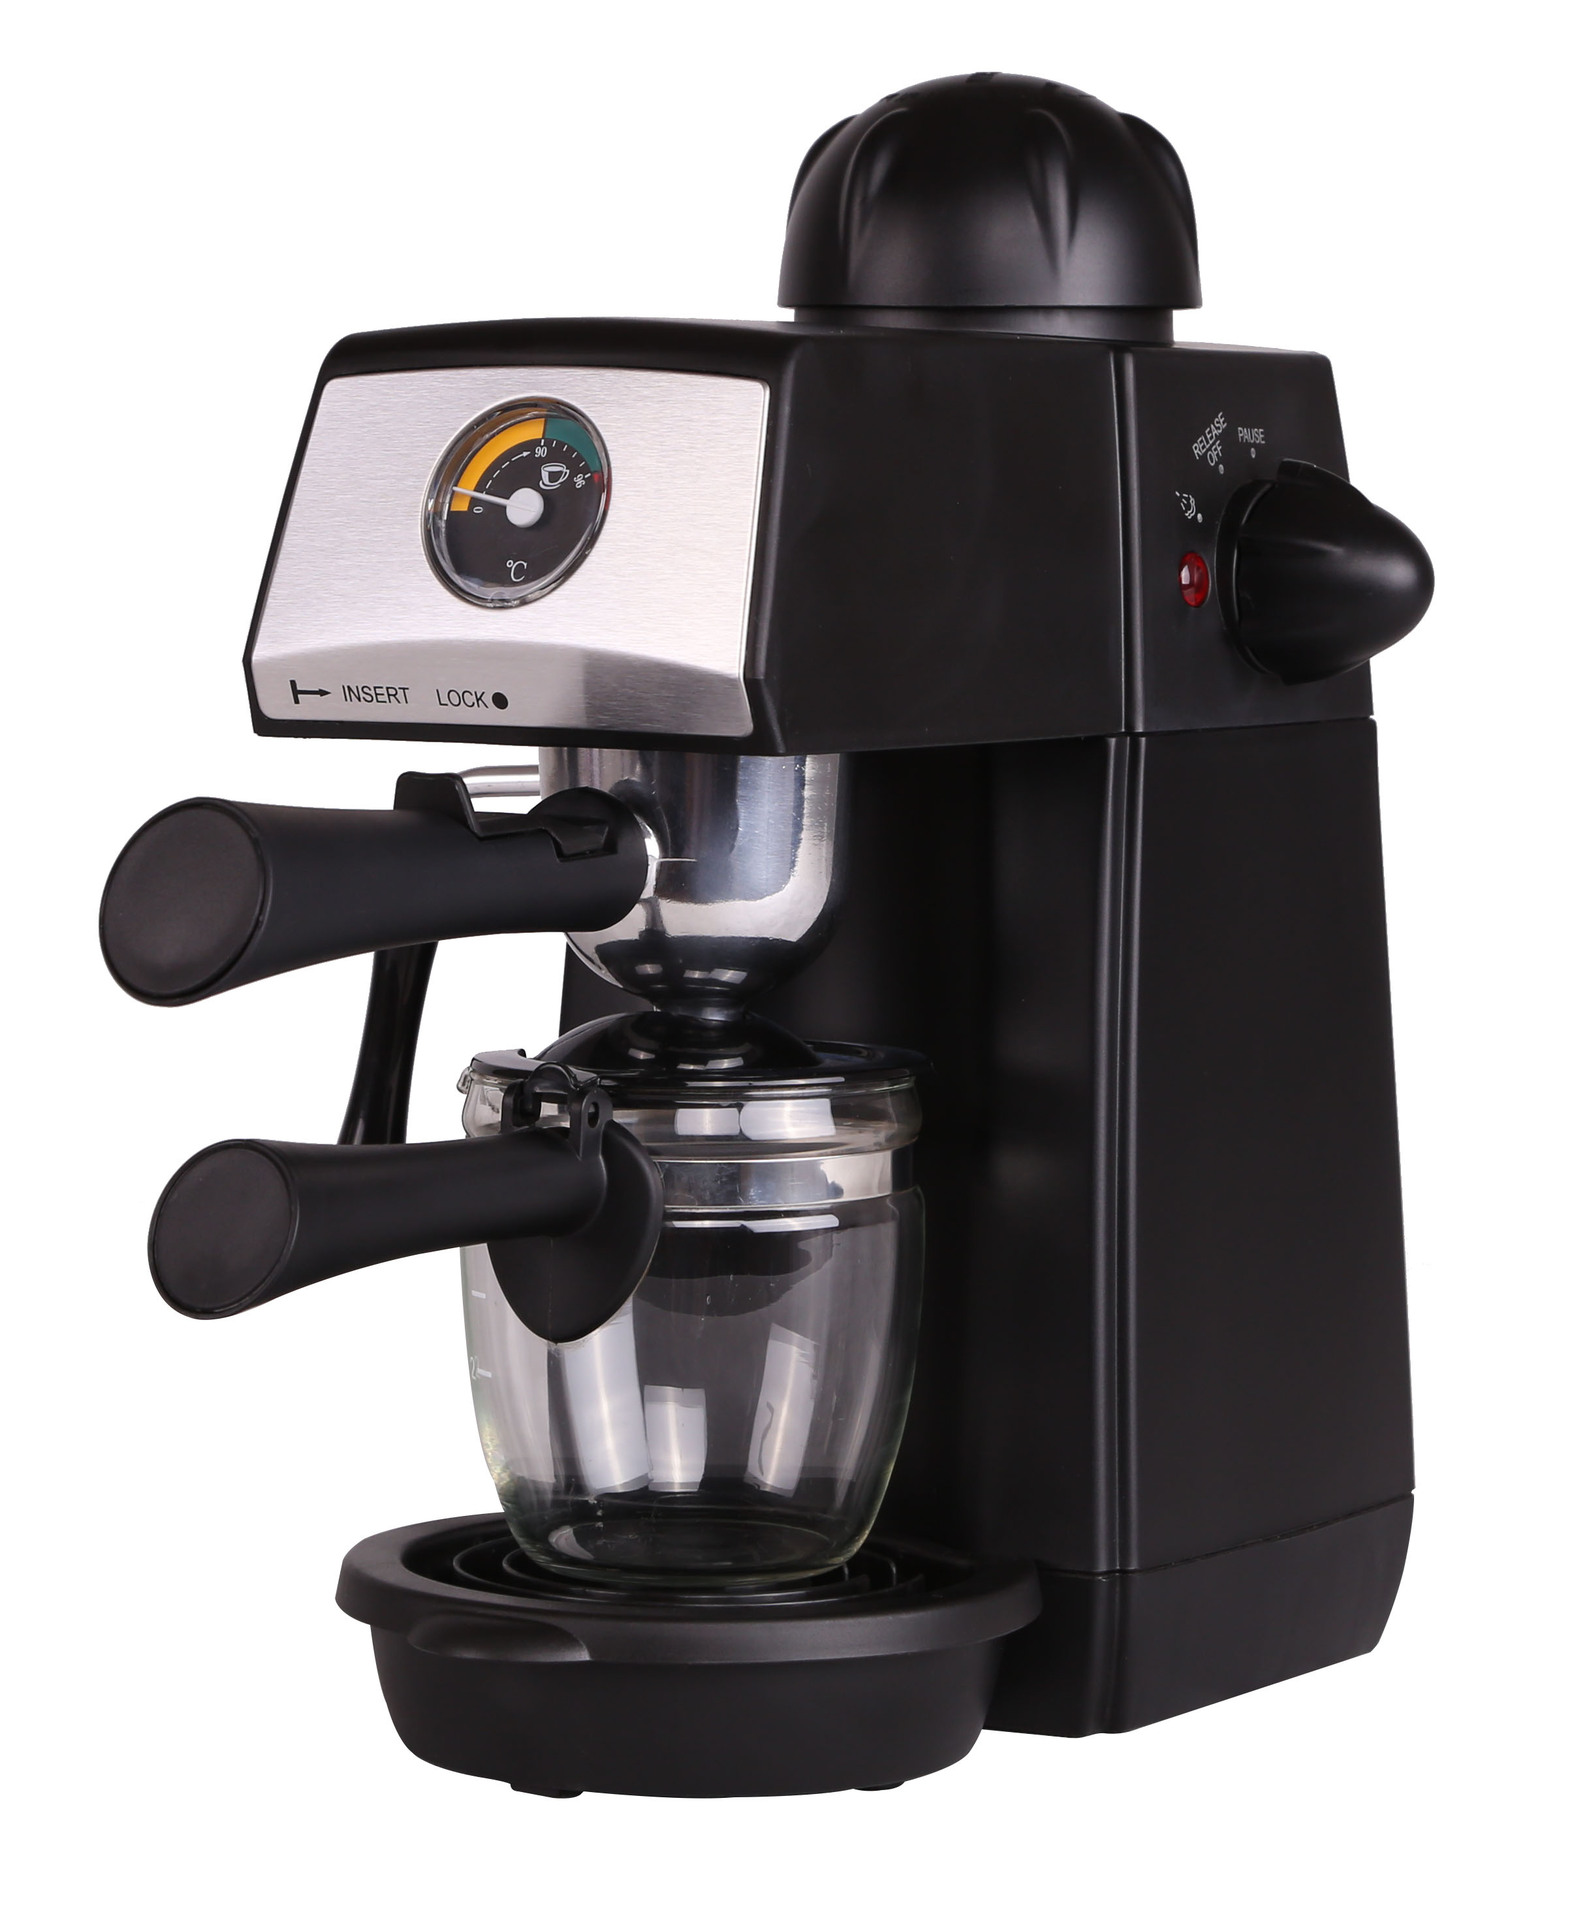 2016 New Espresso Machine Coffee Machine Espresso Maker Semi-automatic Pump Pressure Cappuccino Cafetera Kahve Makinesi new coffee machine home office semi automatic italy type cappuccino espresso coffee maker hot sales